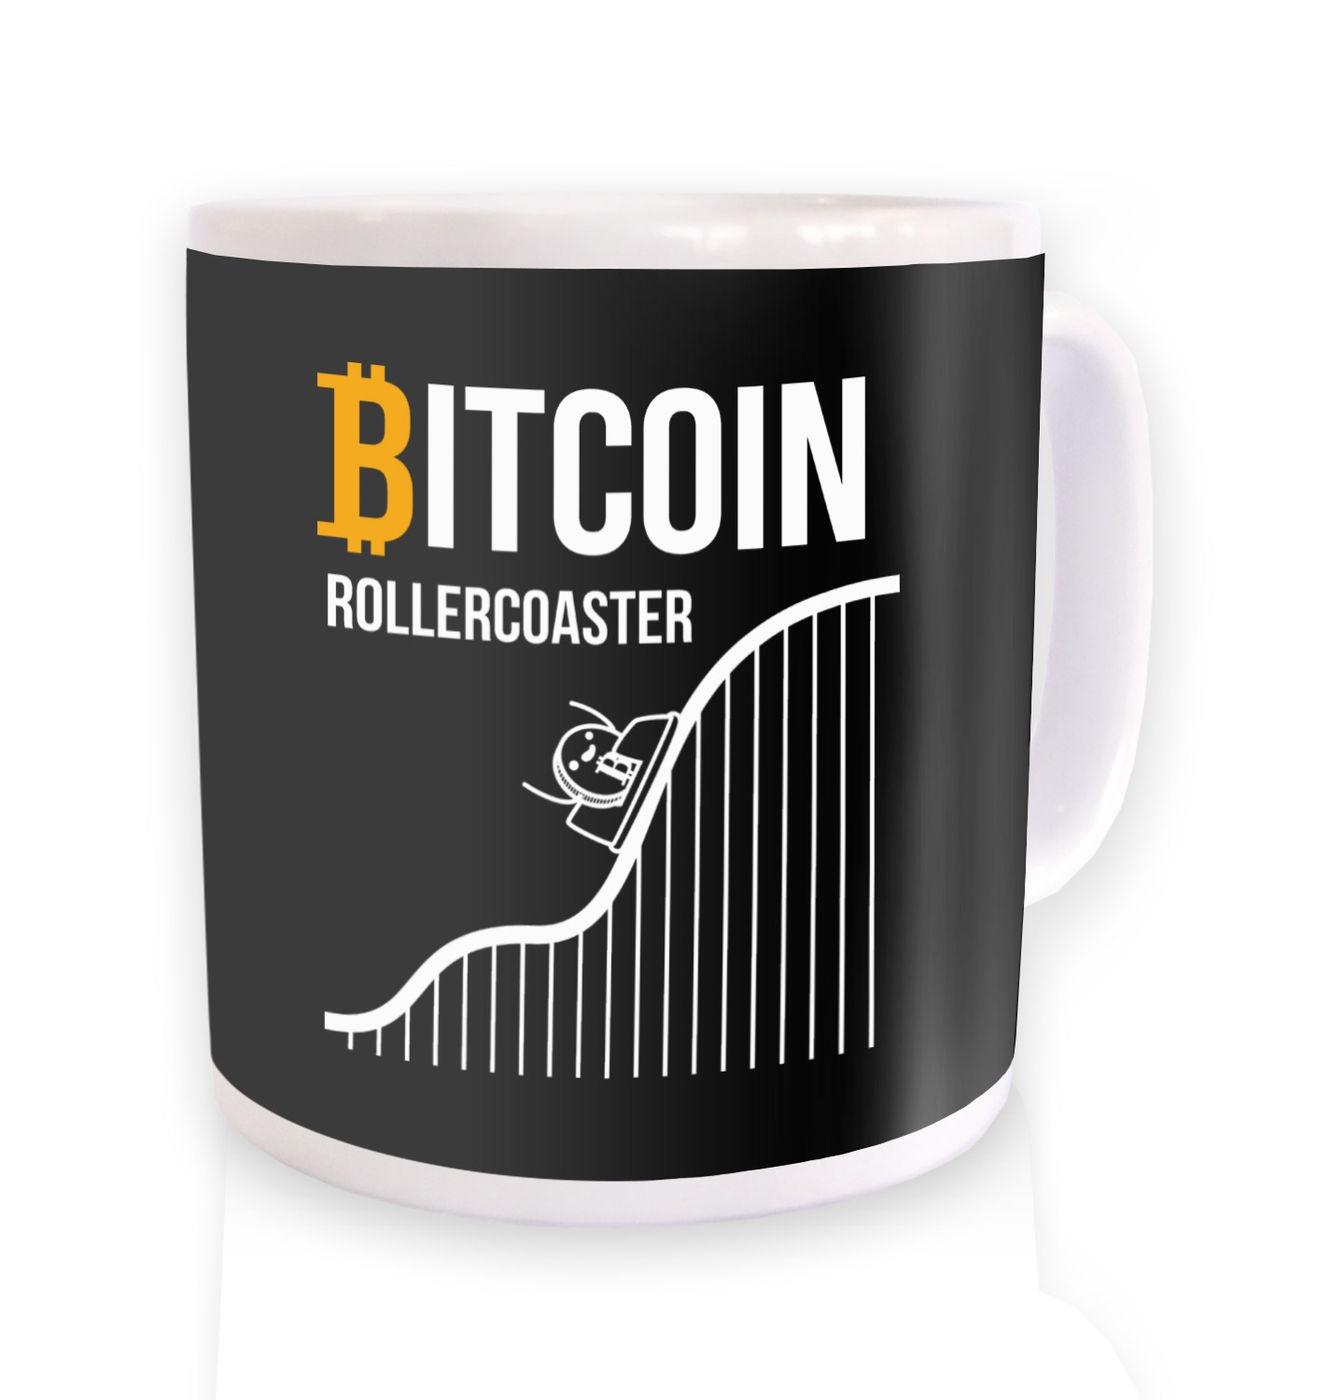 Bitcoin Rollercoaster mug by Something Geeky